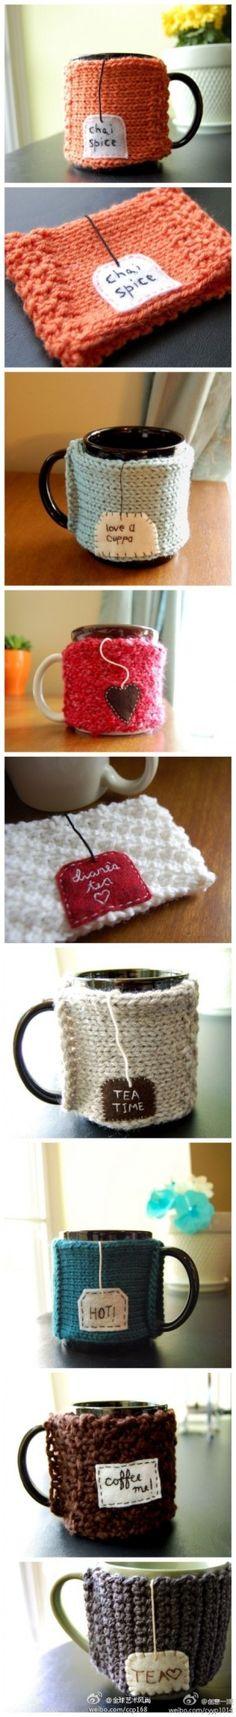 Super adorable cup cozies!